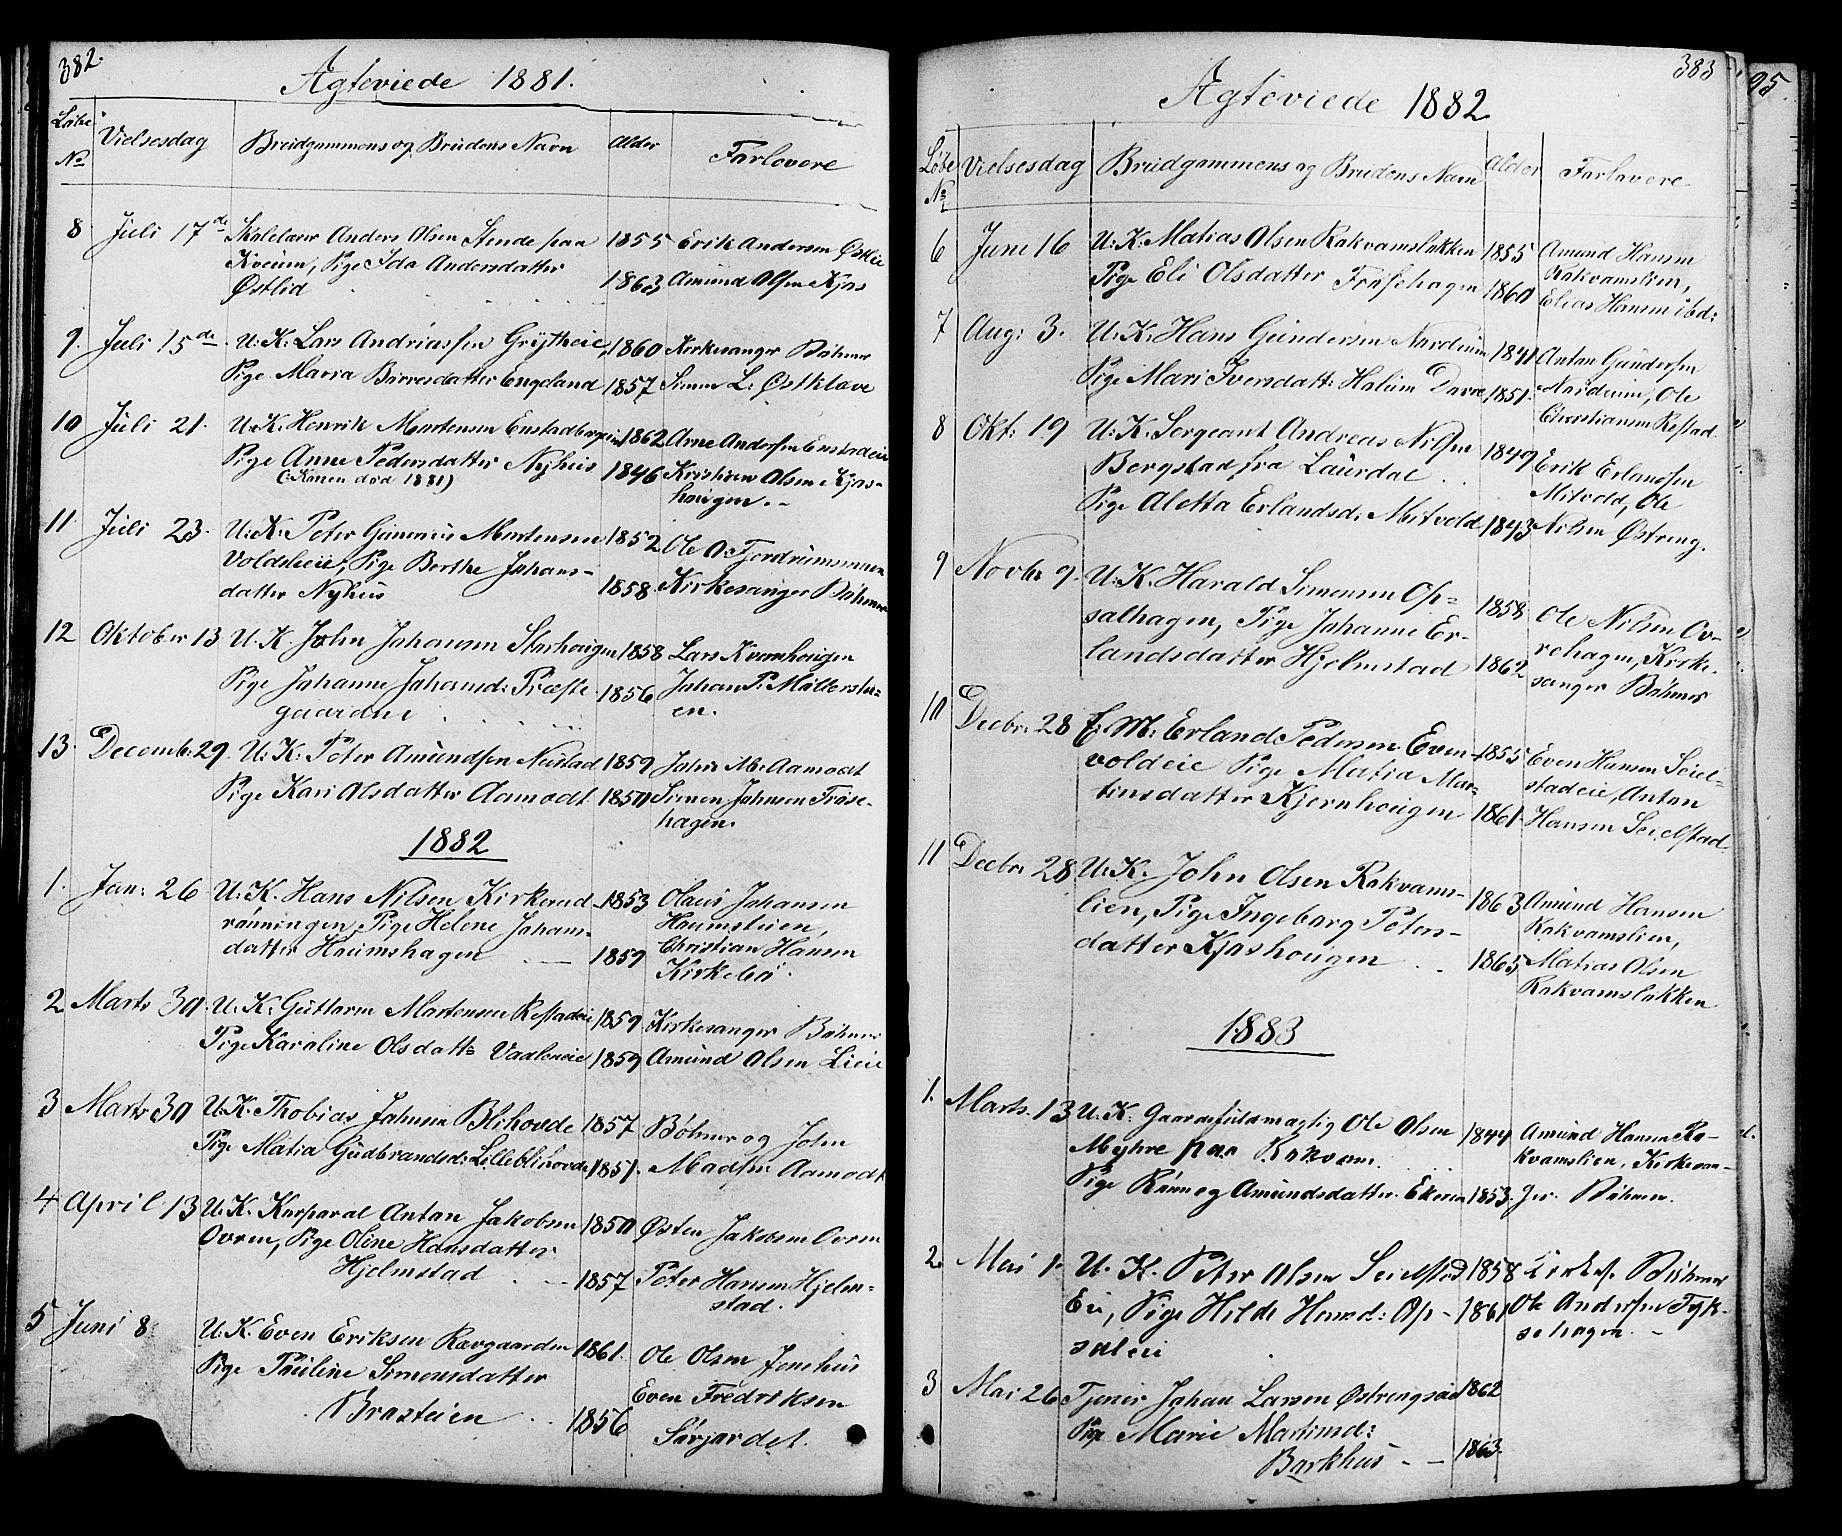 SAH, Østre Gausdal prestekontor, Klokkerbok nr. 1, 1863-1893, s. 382-383